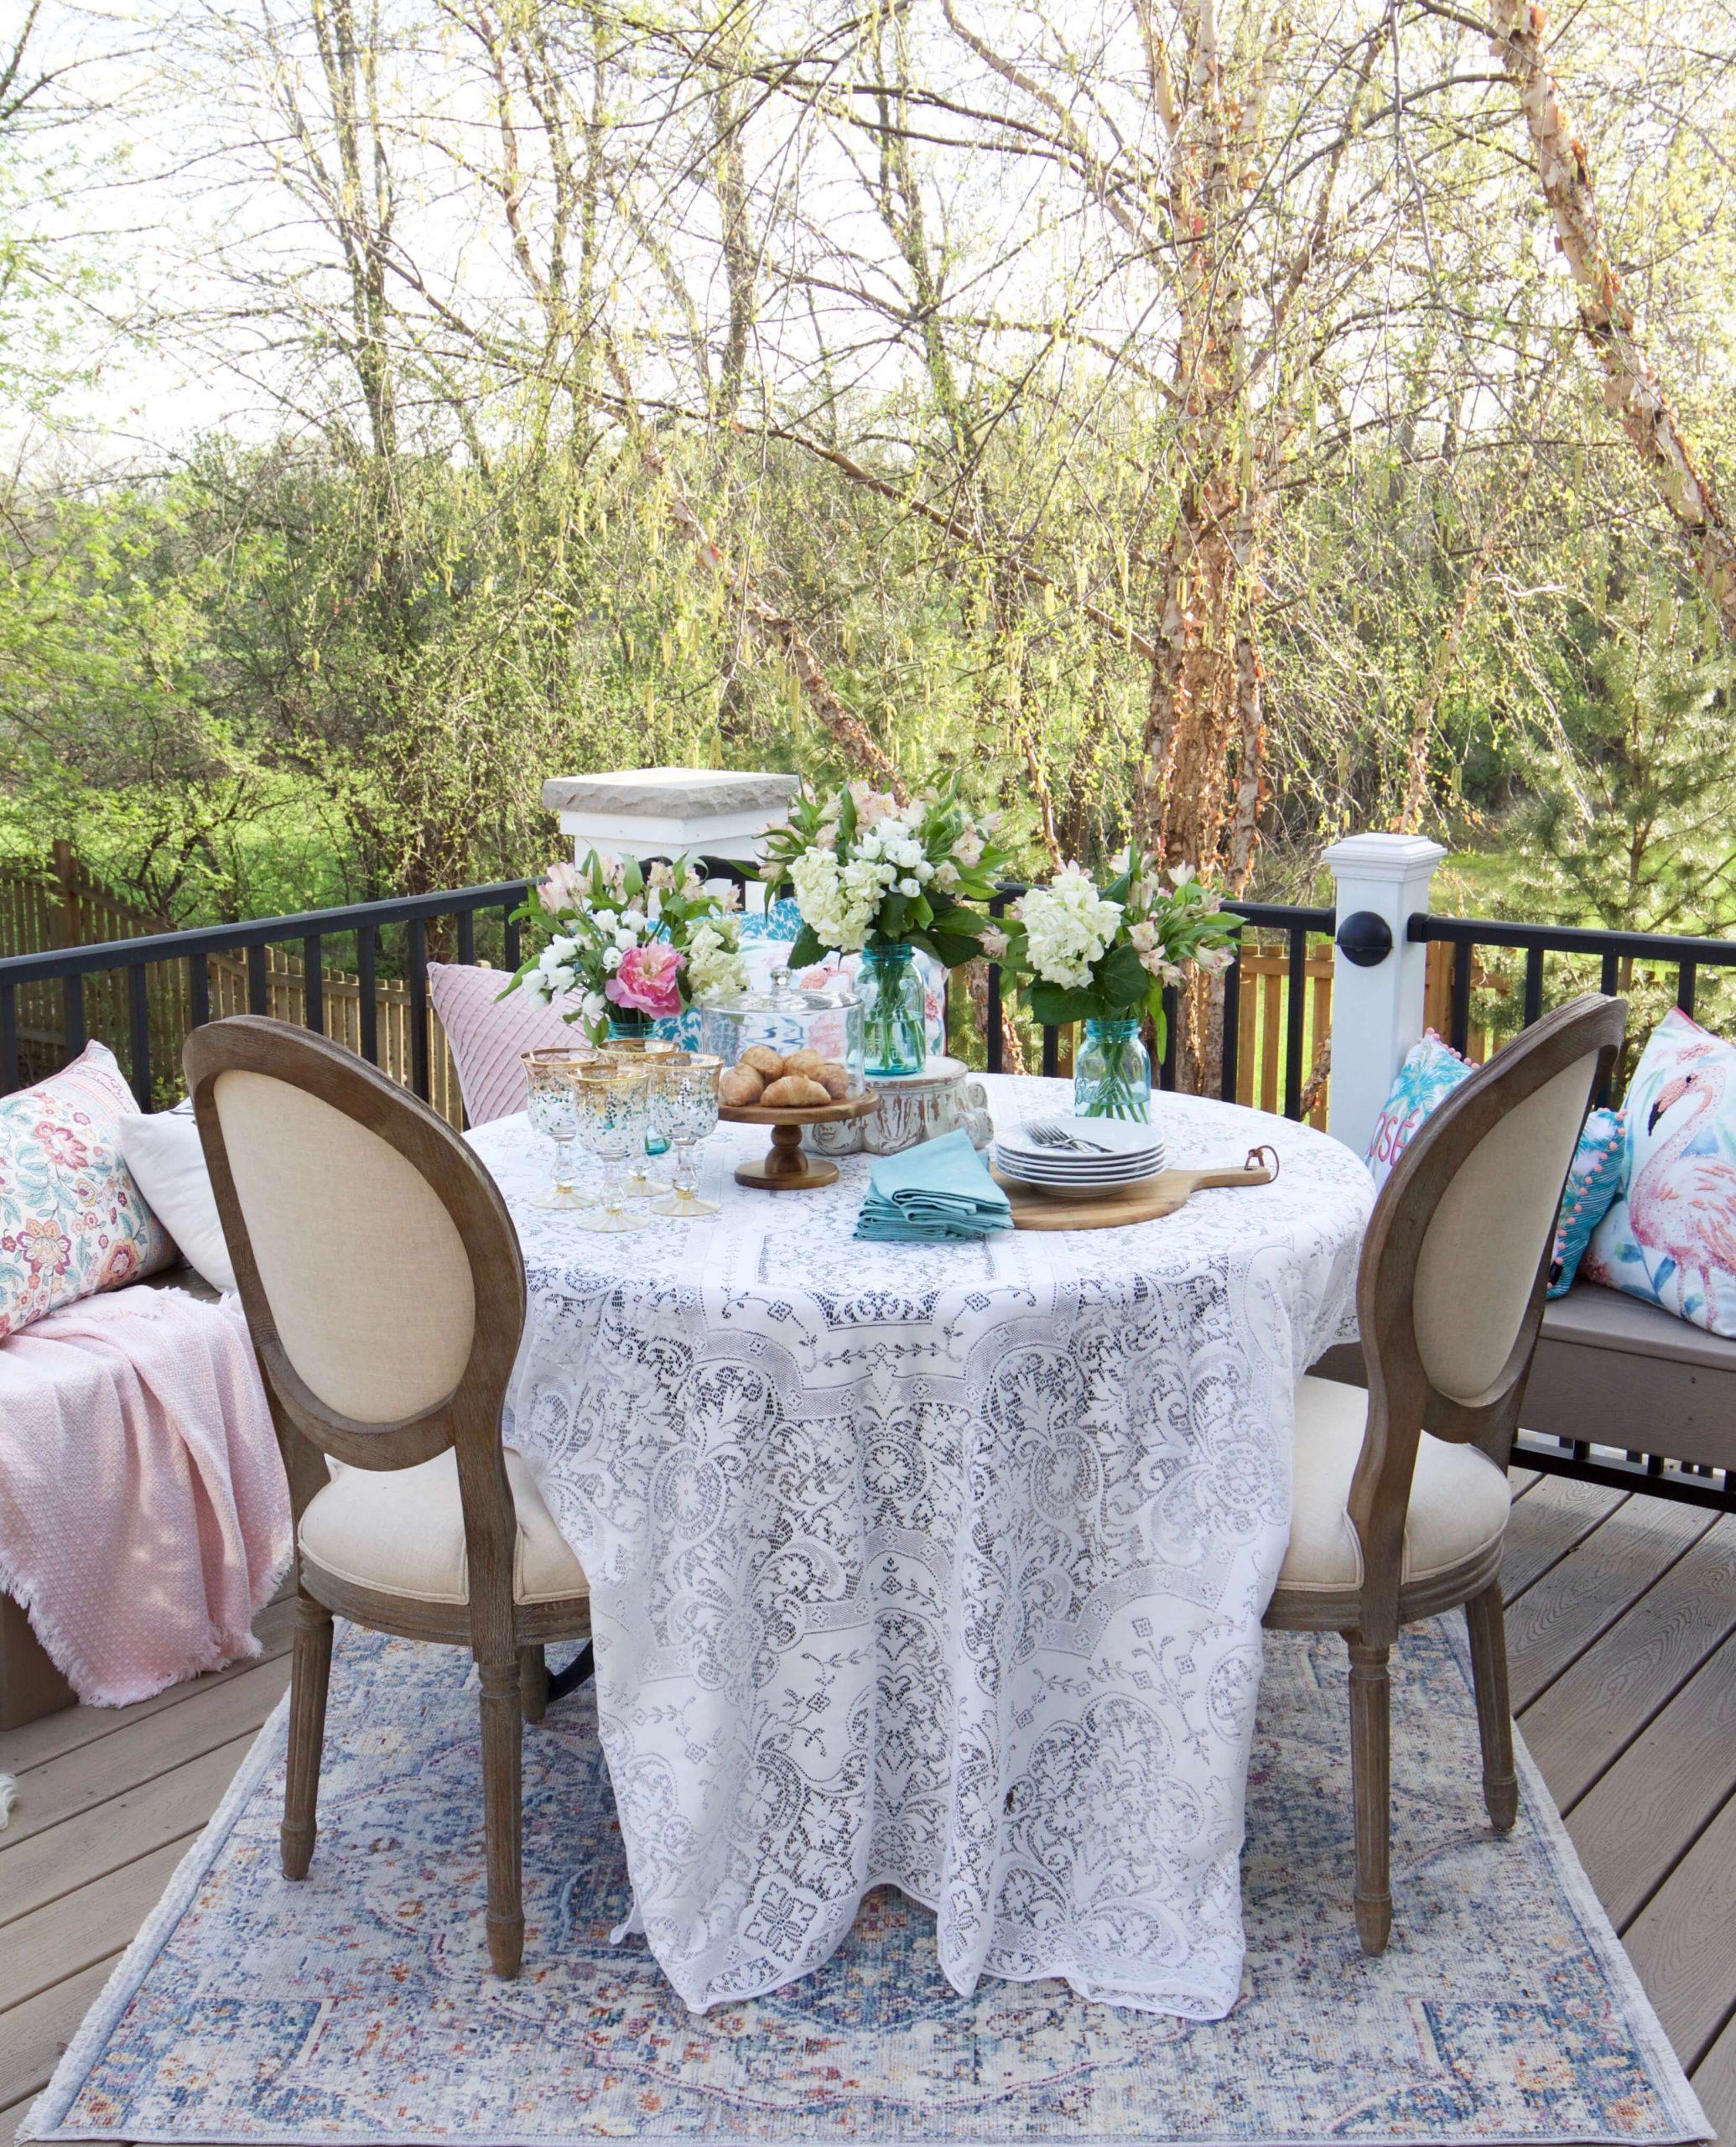 Elegant Balcony Dining Area is Satisfying